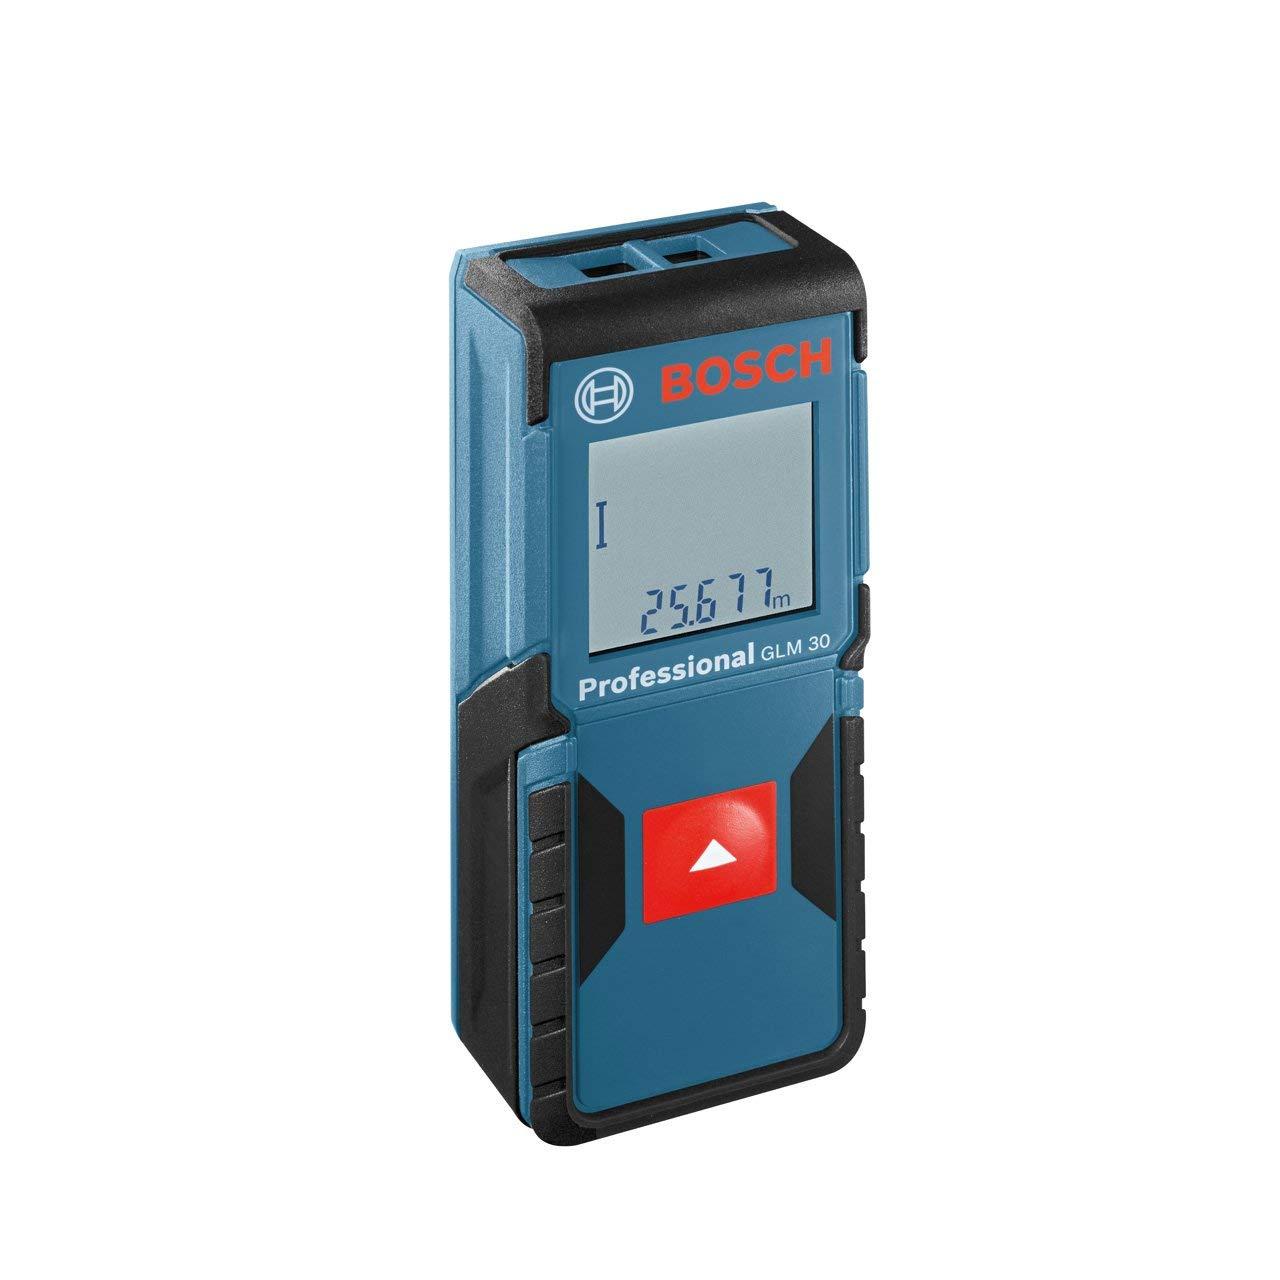 Bosch GLM 30 Professional Laser Measure